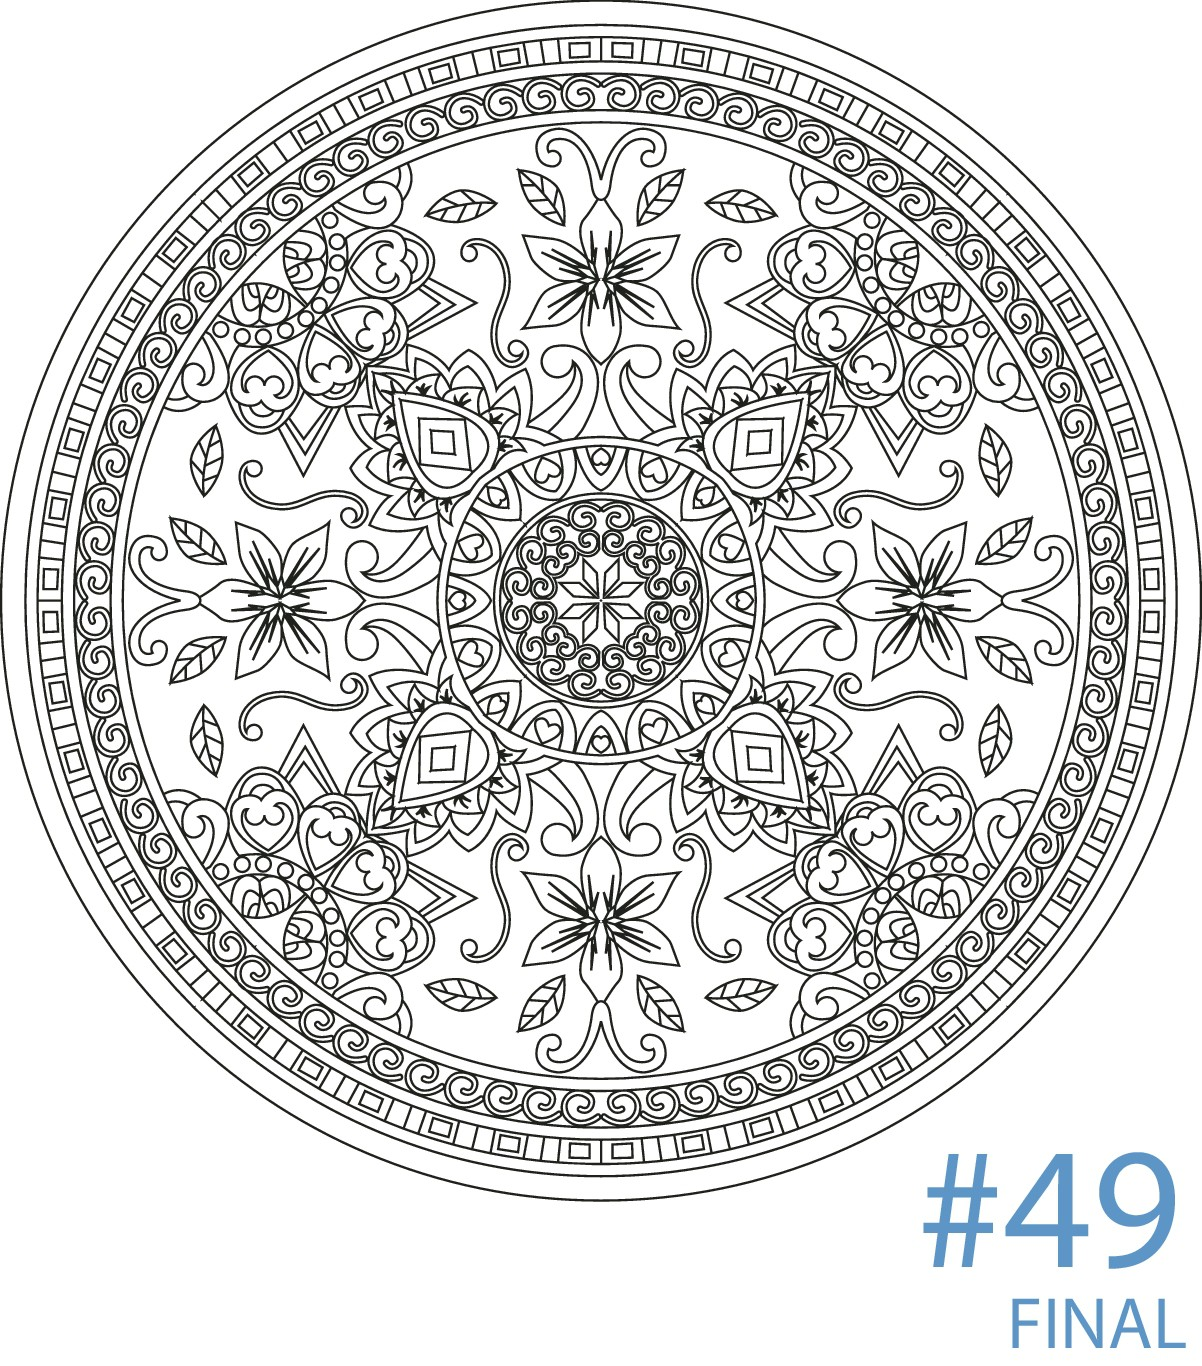 Create 50 mandala designs  in 14 days